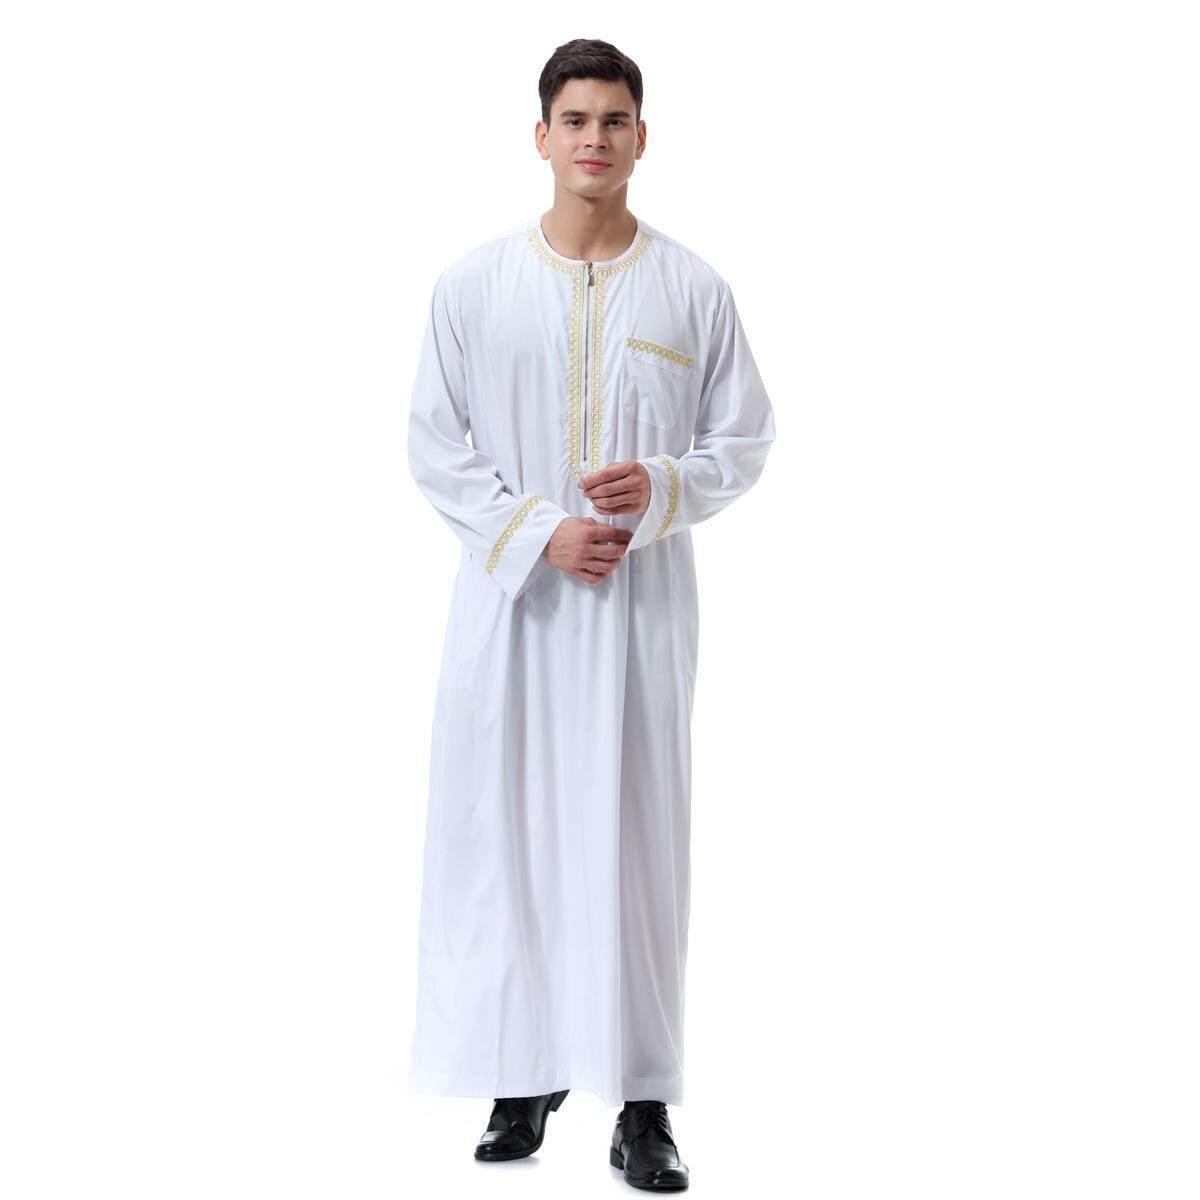 New hot Muslim Arab Middle Eastern men's printed zipper round neck robe